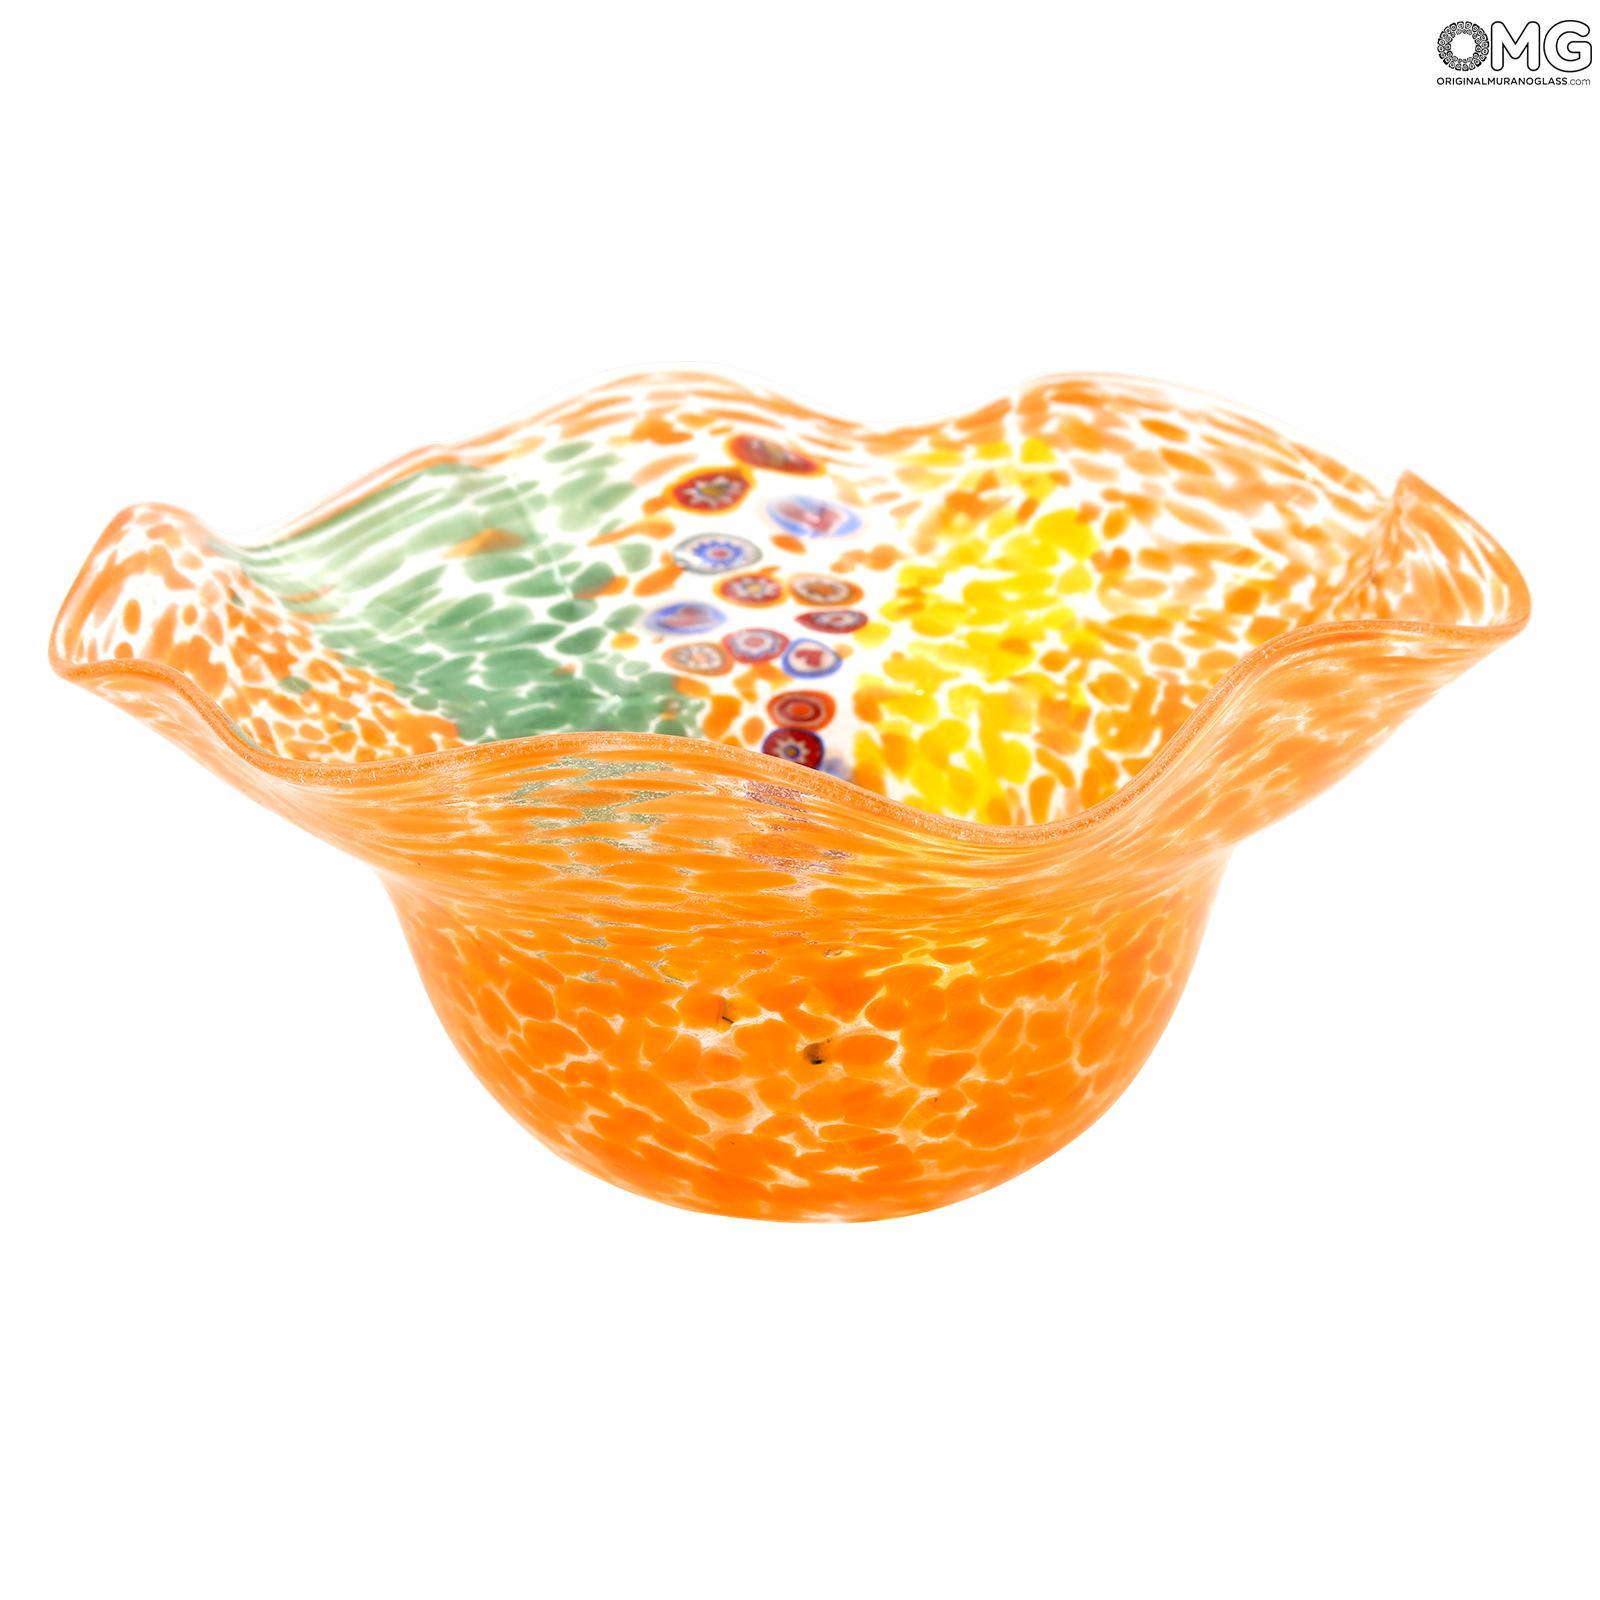 Bowl Centerpiece Rainbow - Orange - Original Murano Glass OMG